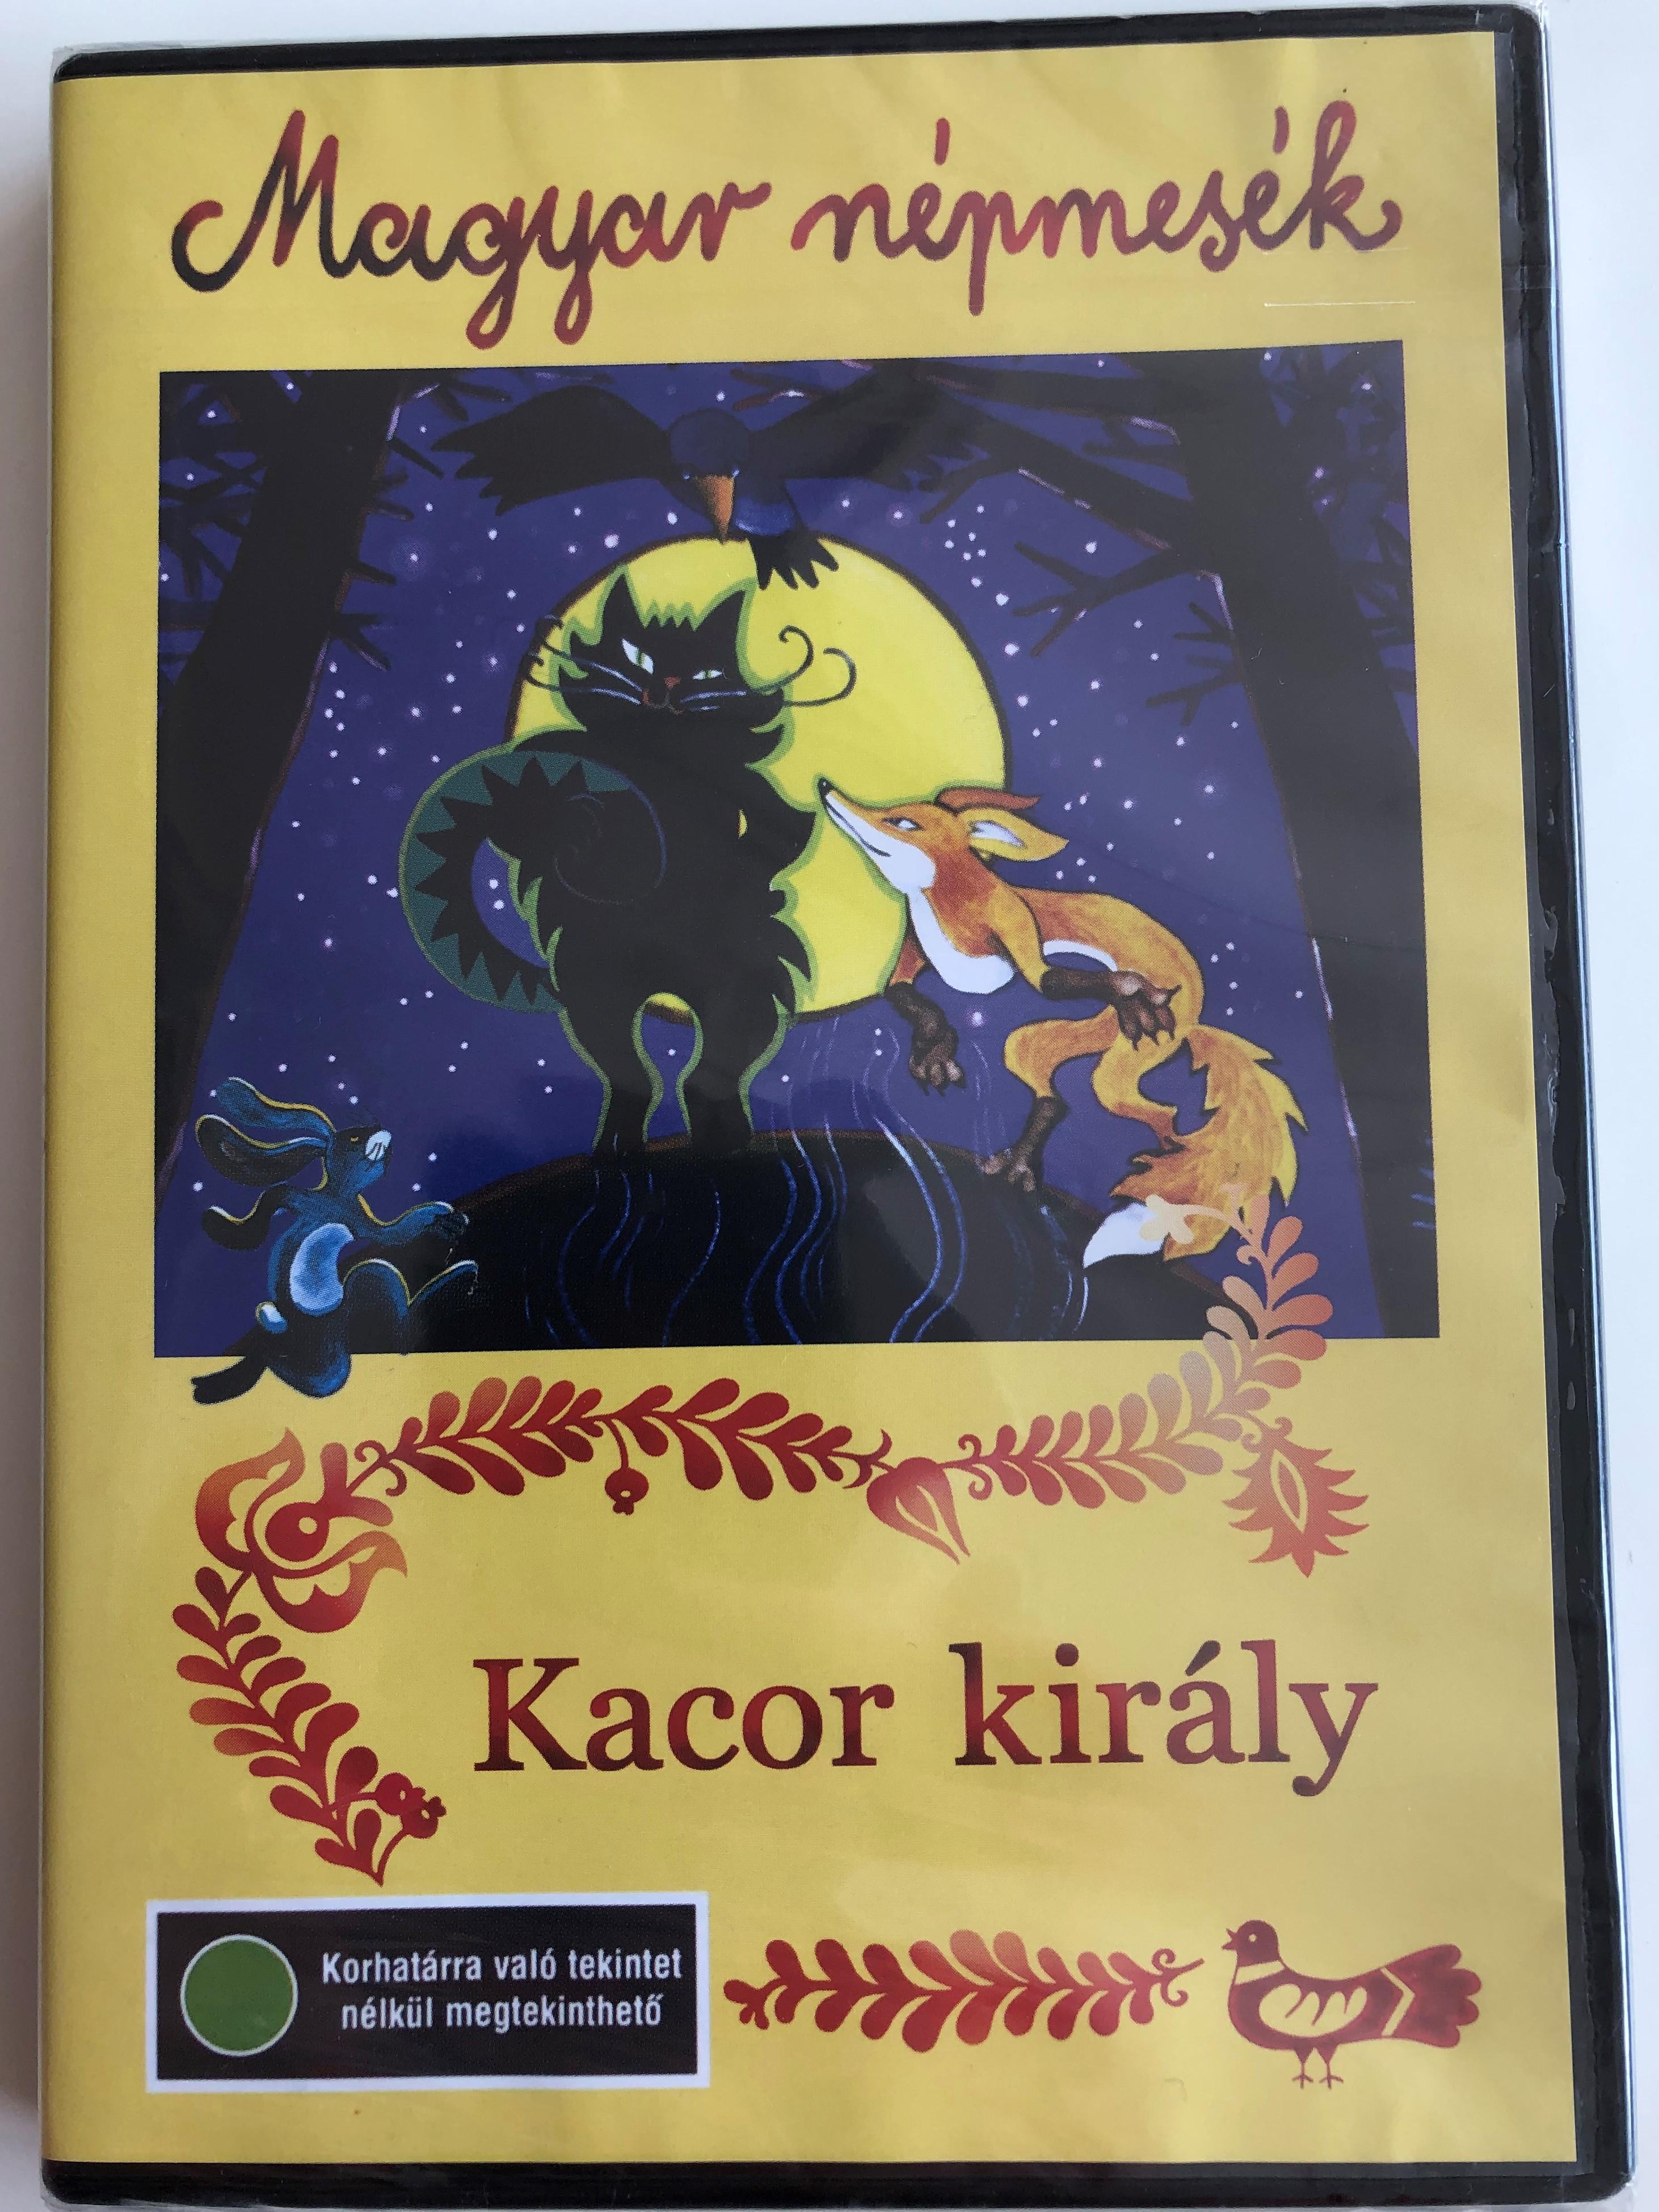 kacor-kir-ly-magyar-n-pmes-k-hungarian-folk-tales-for-children-1.jpg